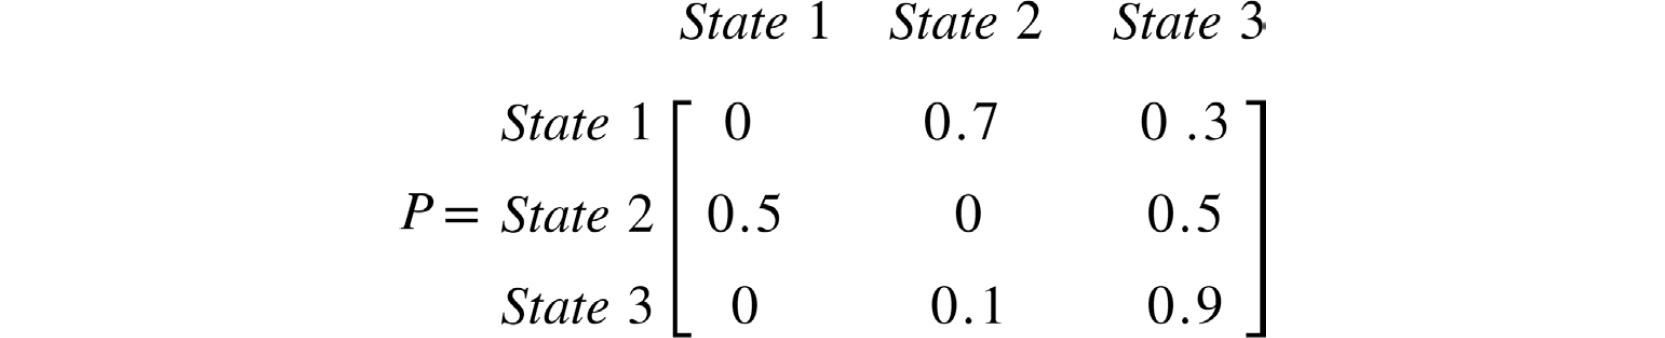 Figure 2.7: Transition matrix for the MC in Figure 2.6